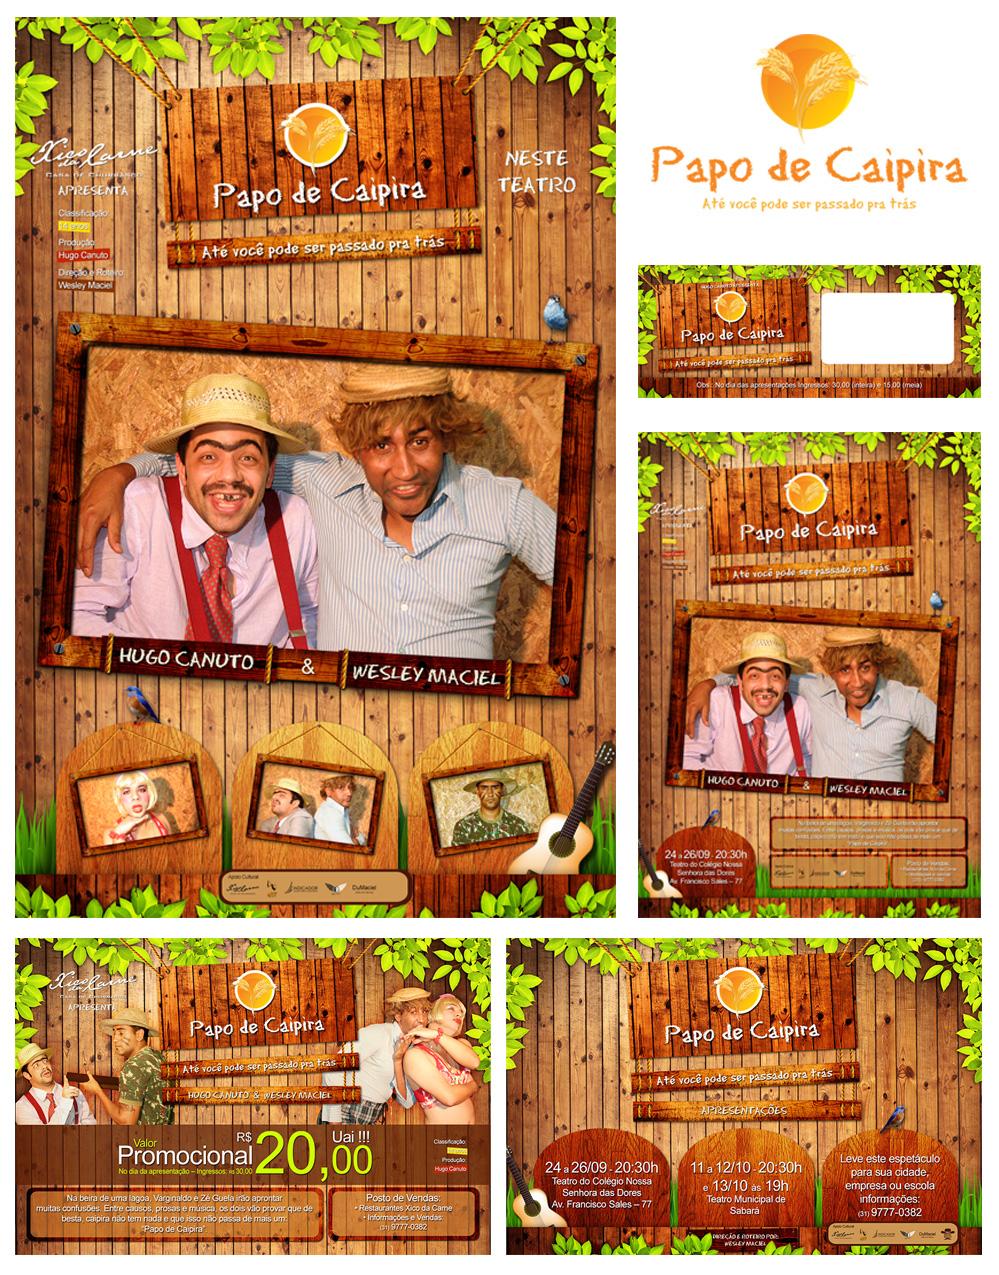 PapoDeCaipira_Impresso